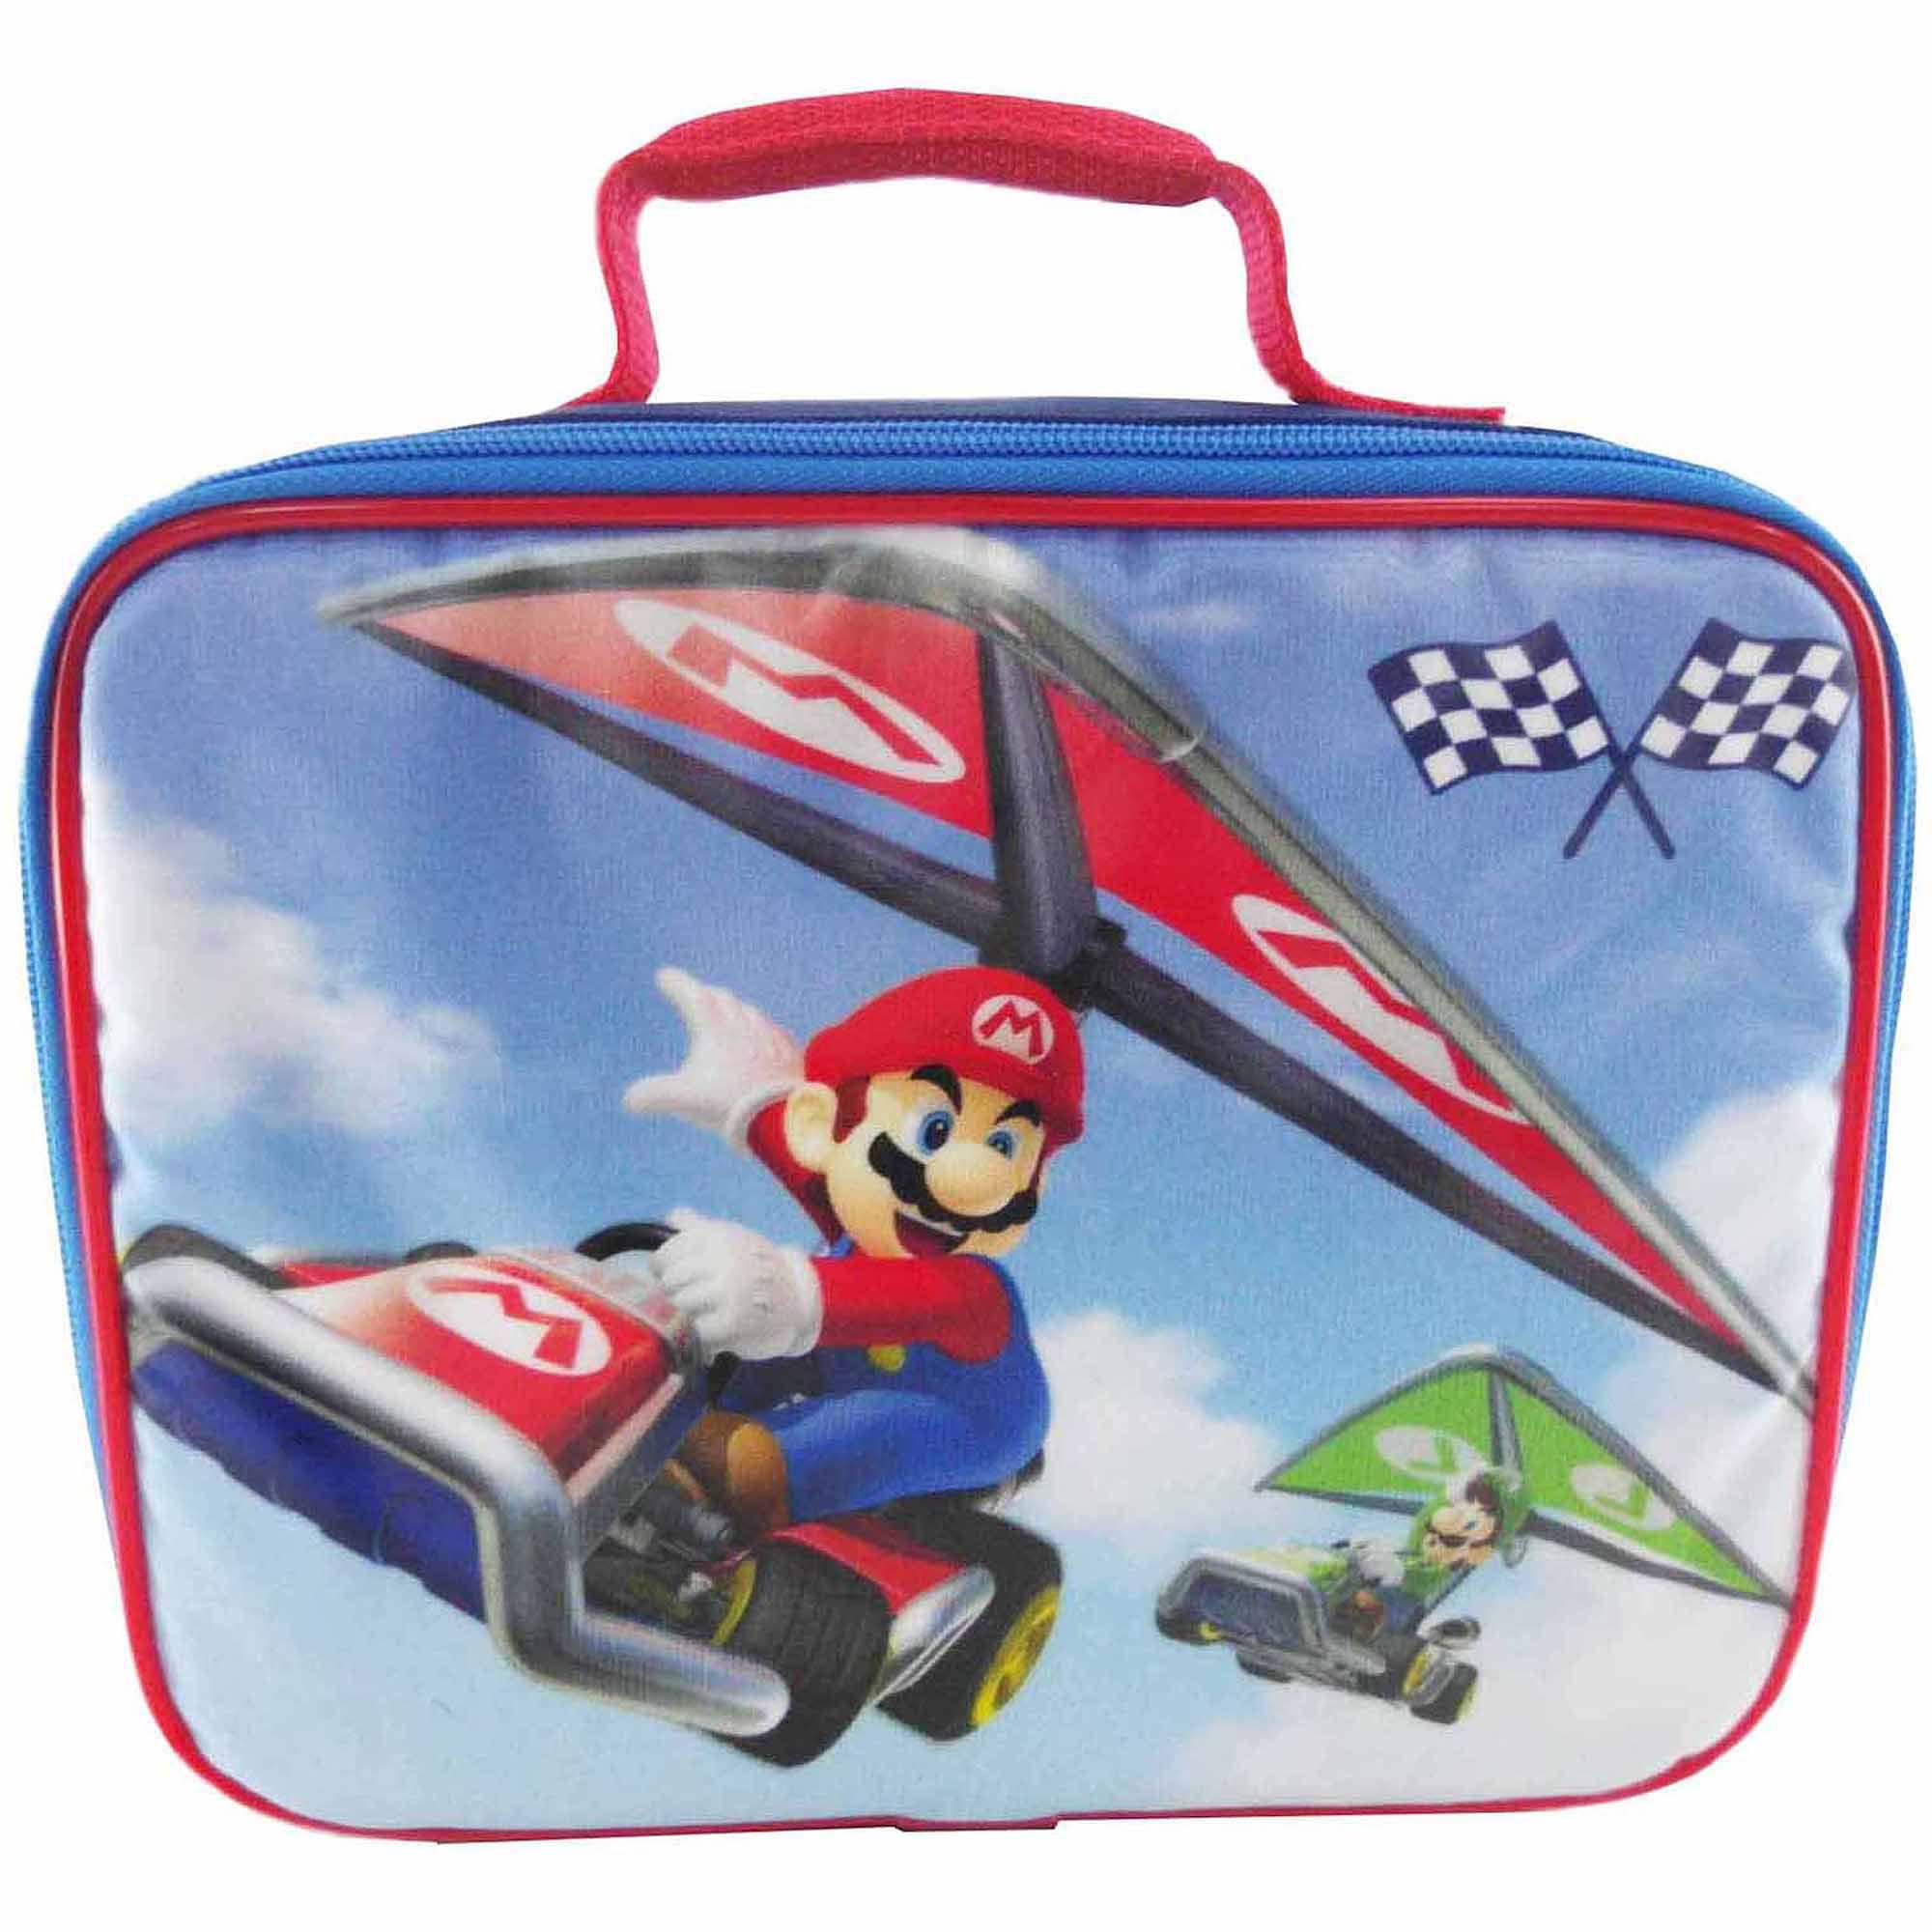 Nintendo Mario Kart Lunch Kit, Black